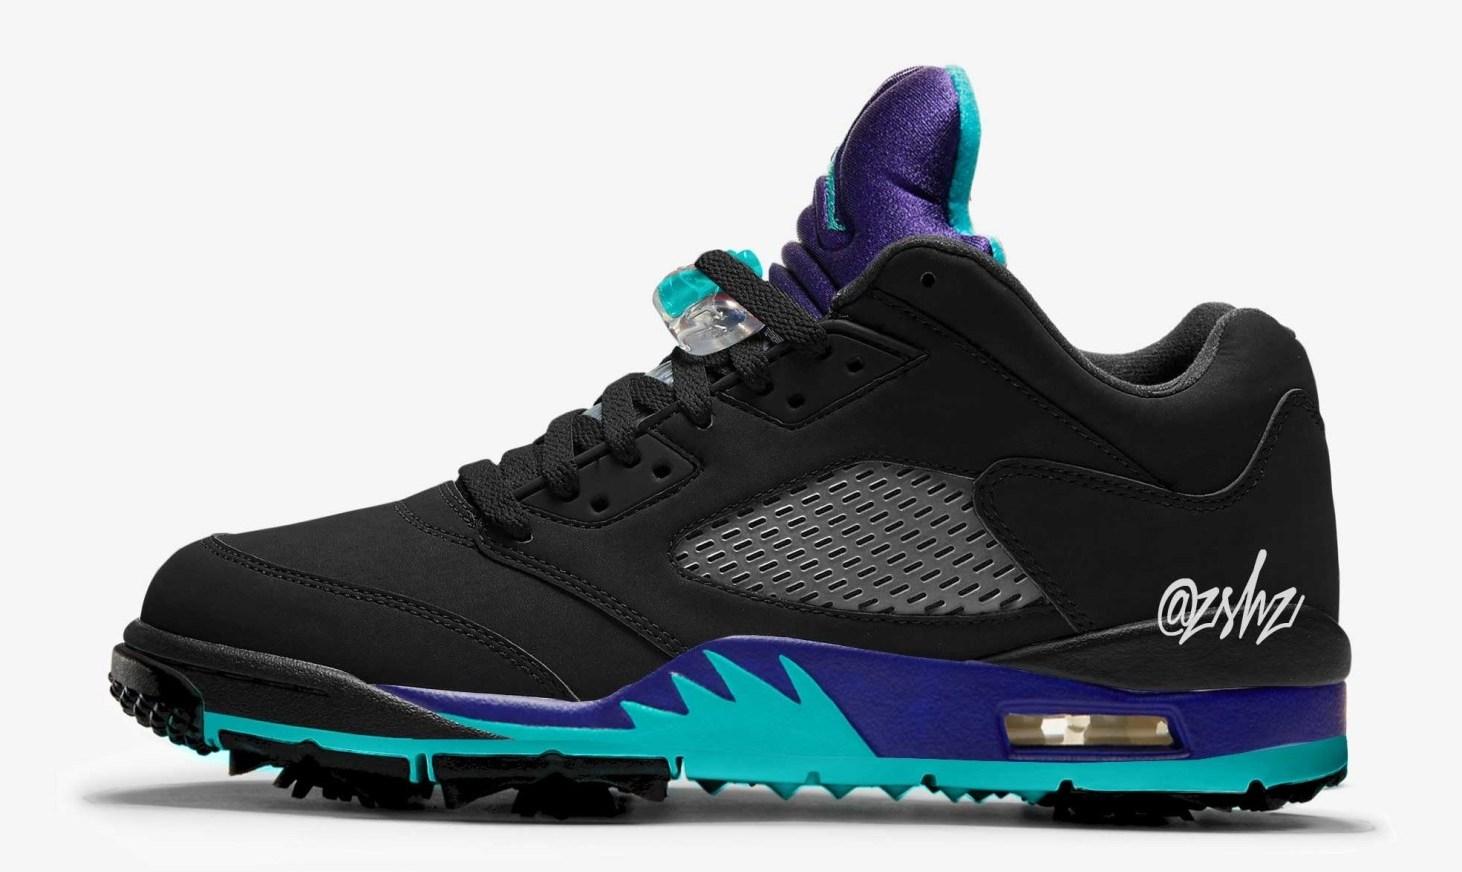 Air Jordan 5 Low Golf Black Grape Release Date Sole Collector